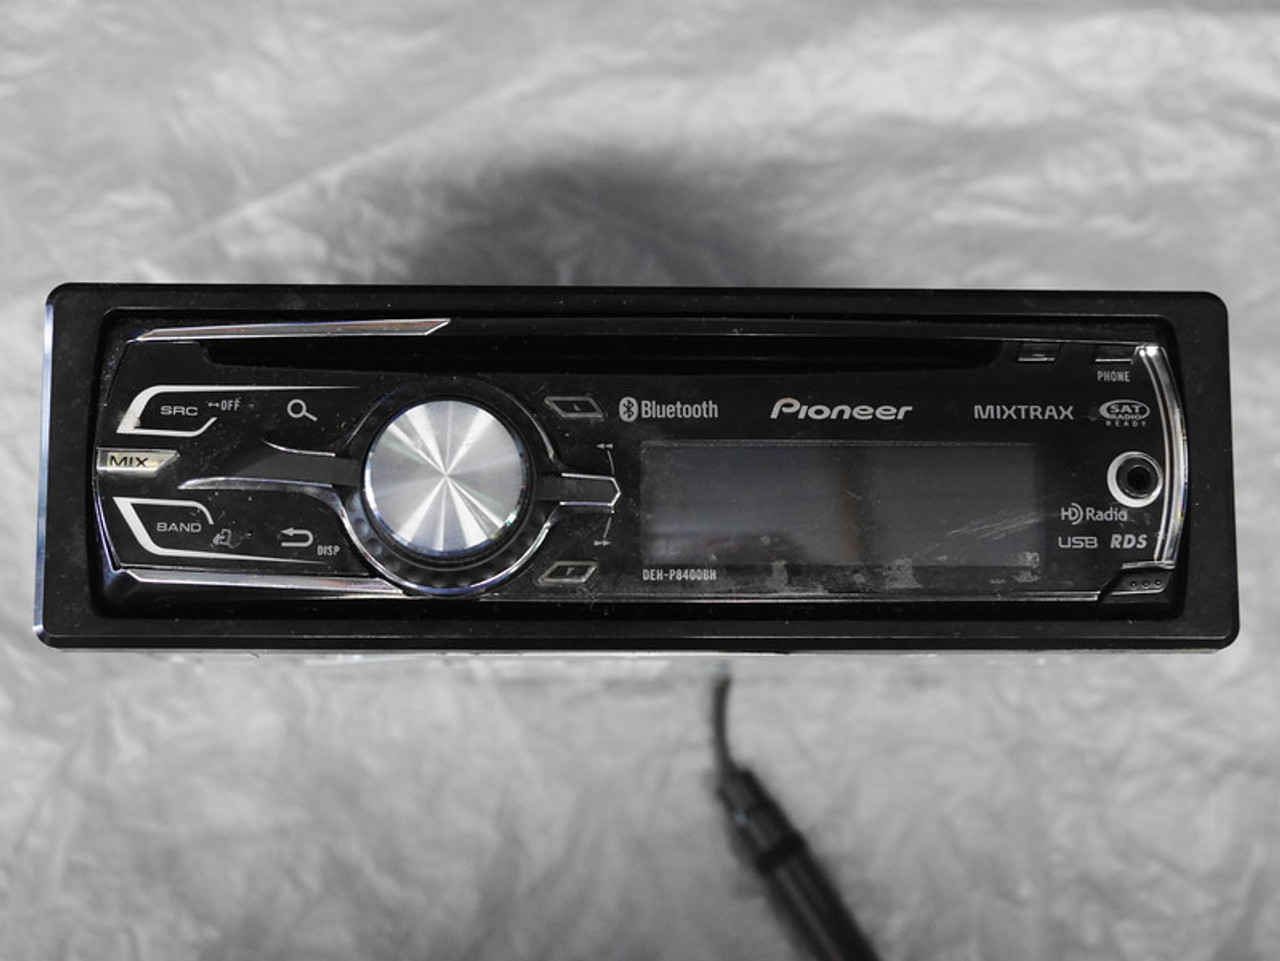 medium resolution of pioneer mixtrax car audio wire harness deh 8400bh wiring diagram used pioneer mixtrax car audio wire